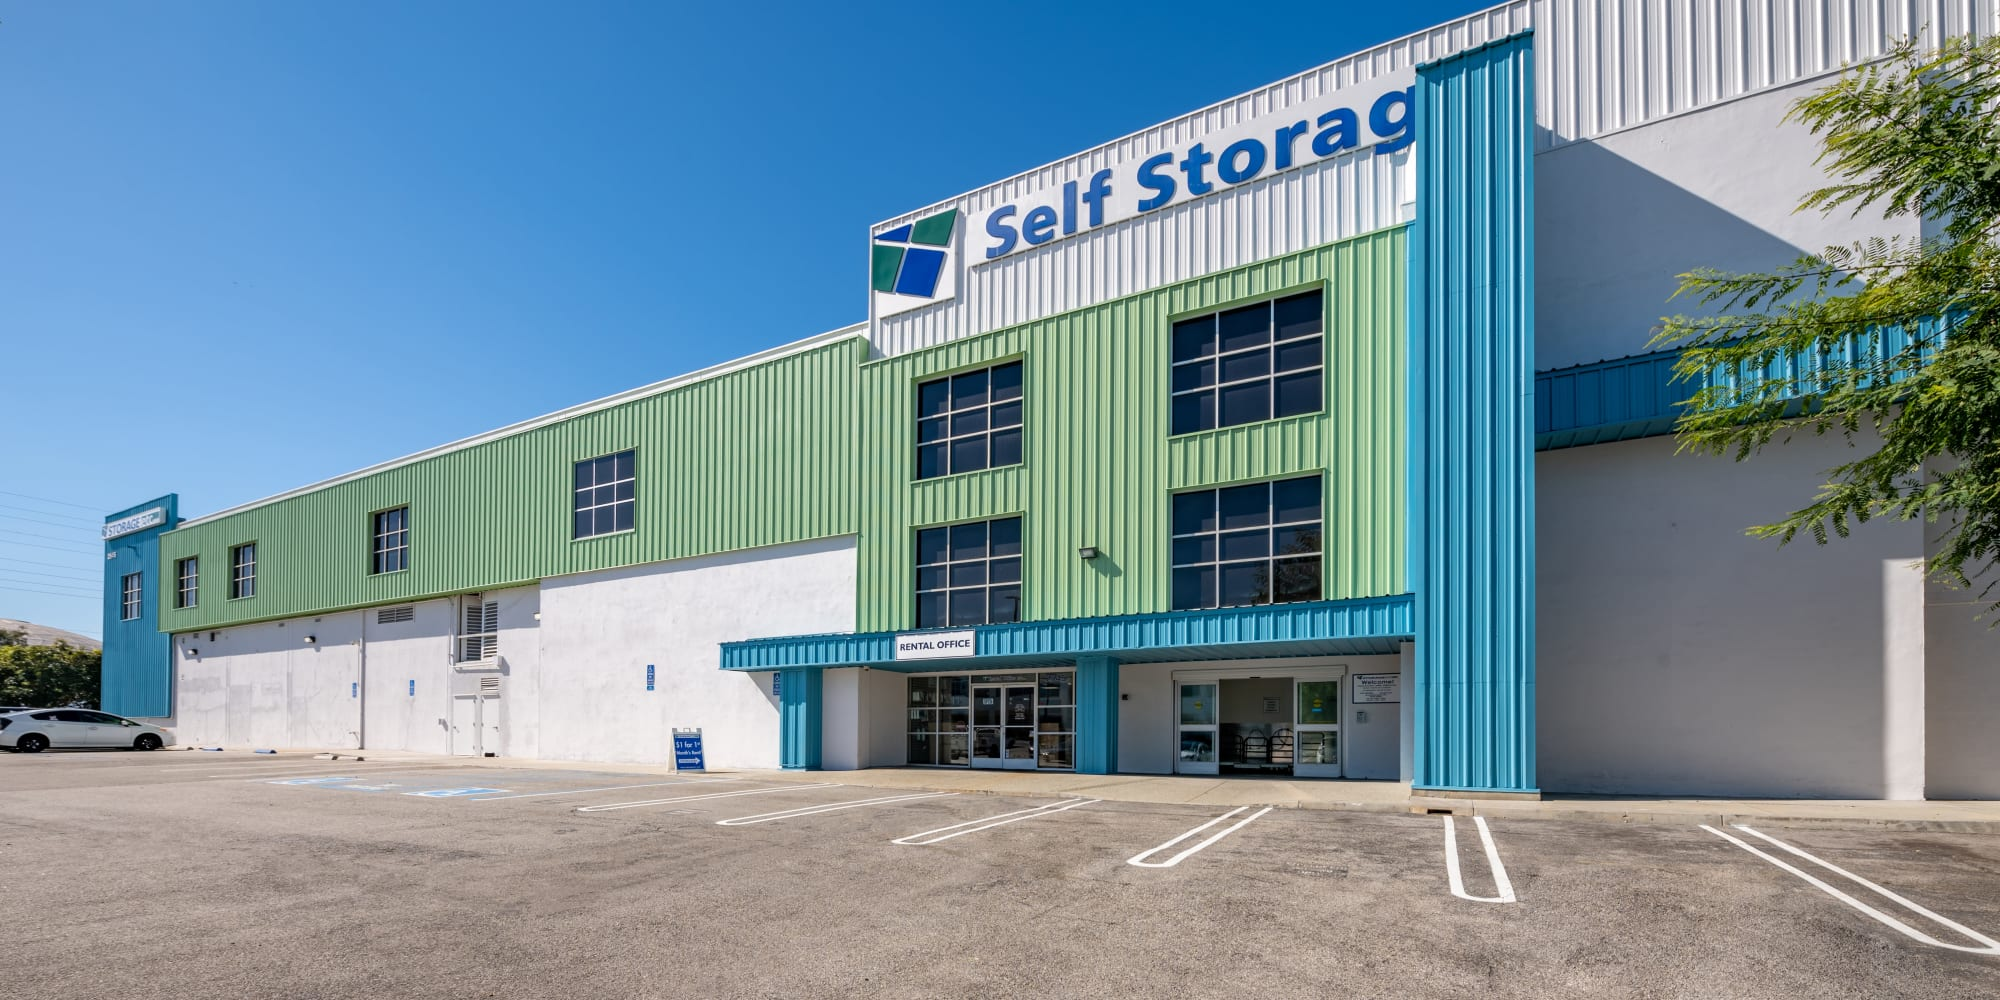 Self storage in Torrance CA